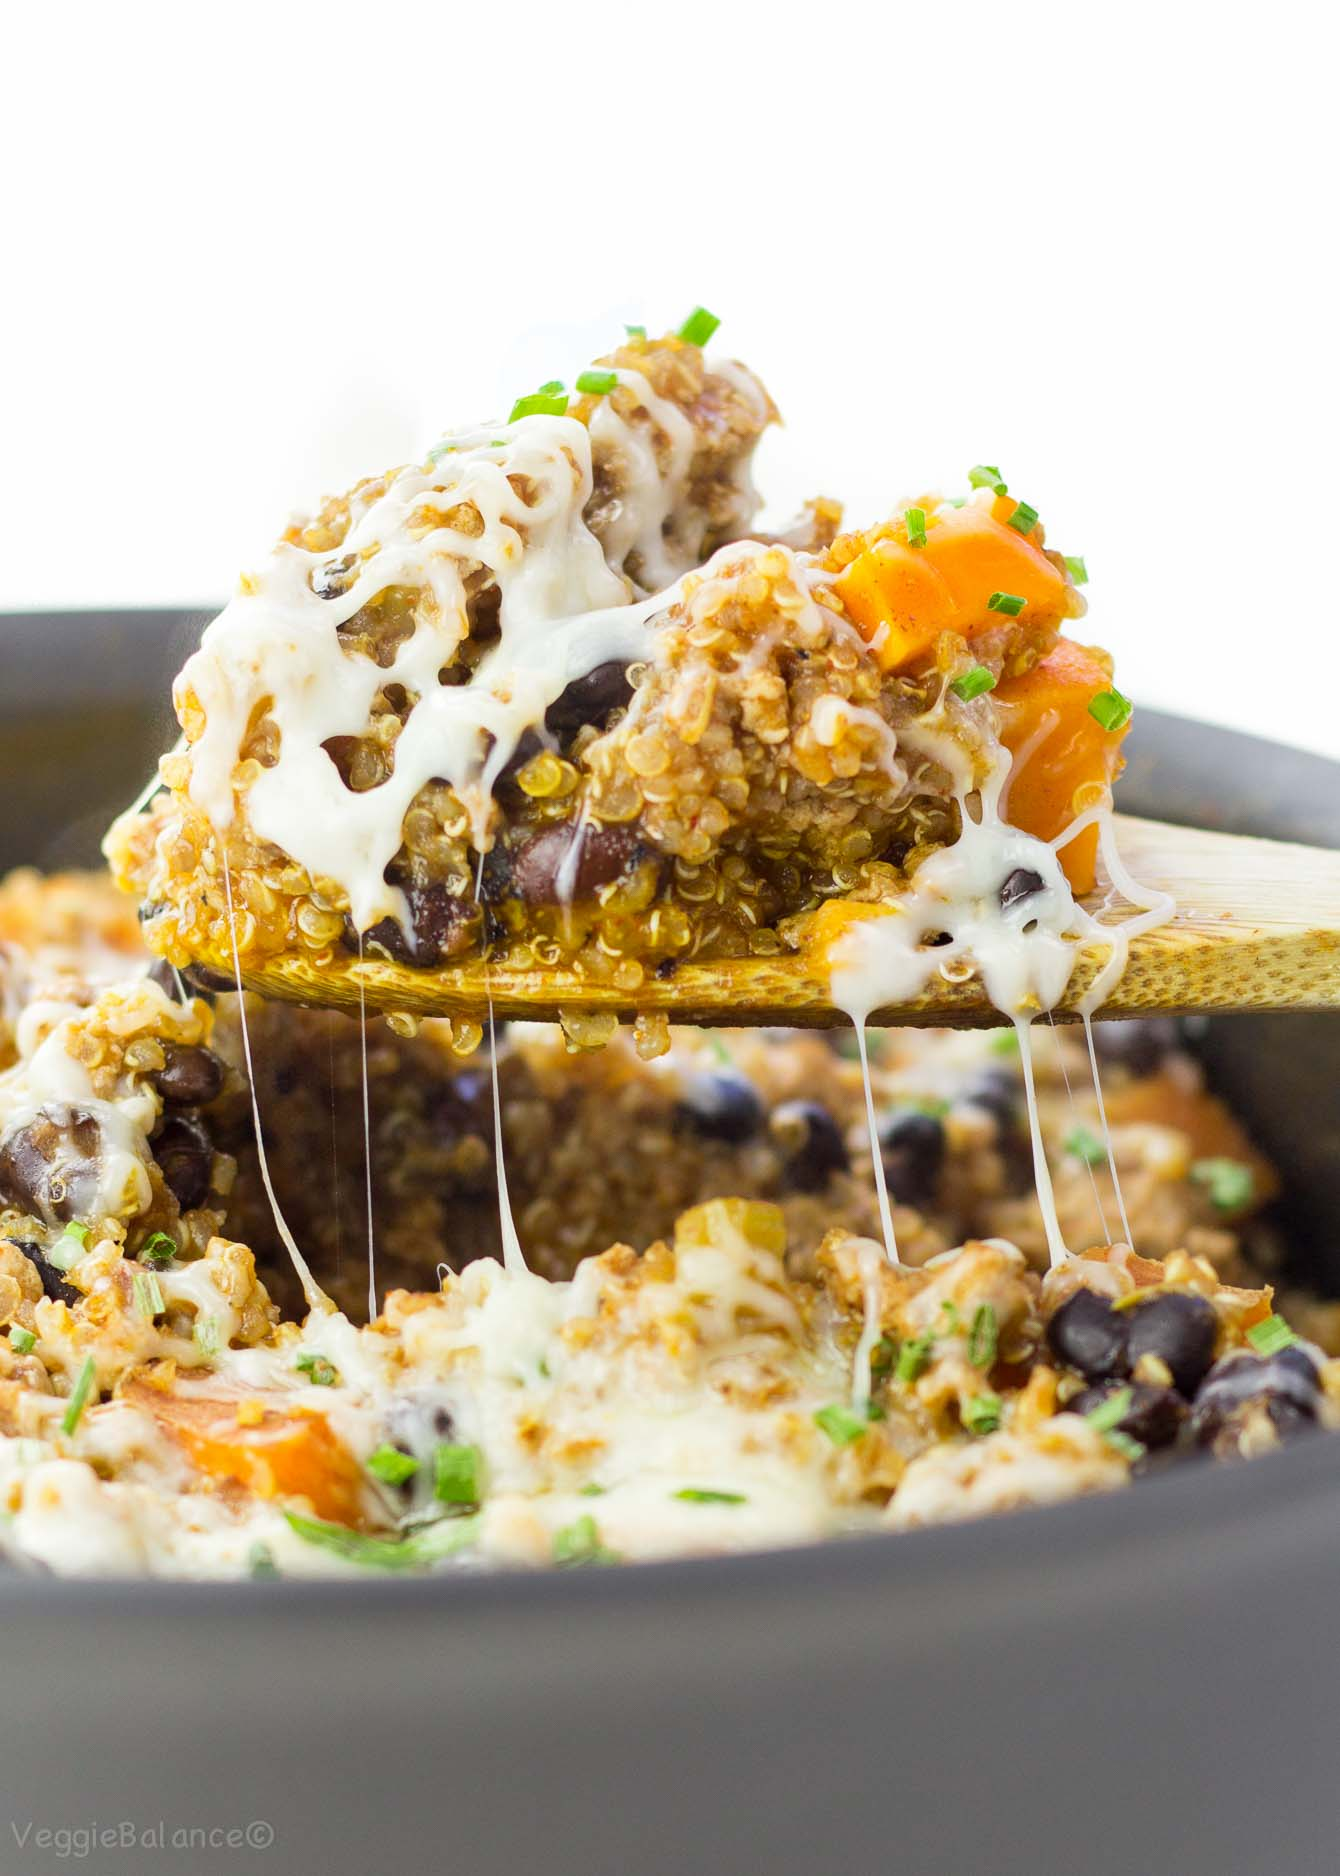 Quinoa Enchilada Recipe Gluten Free, Dairy Free - Veggiebalance.com